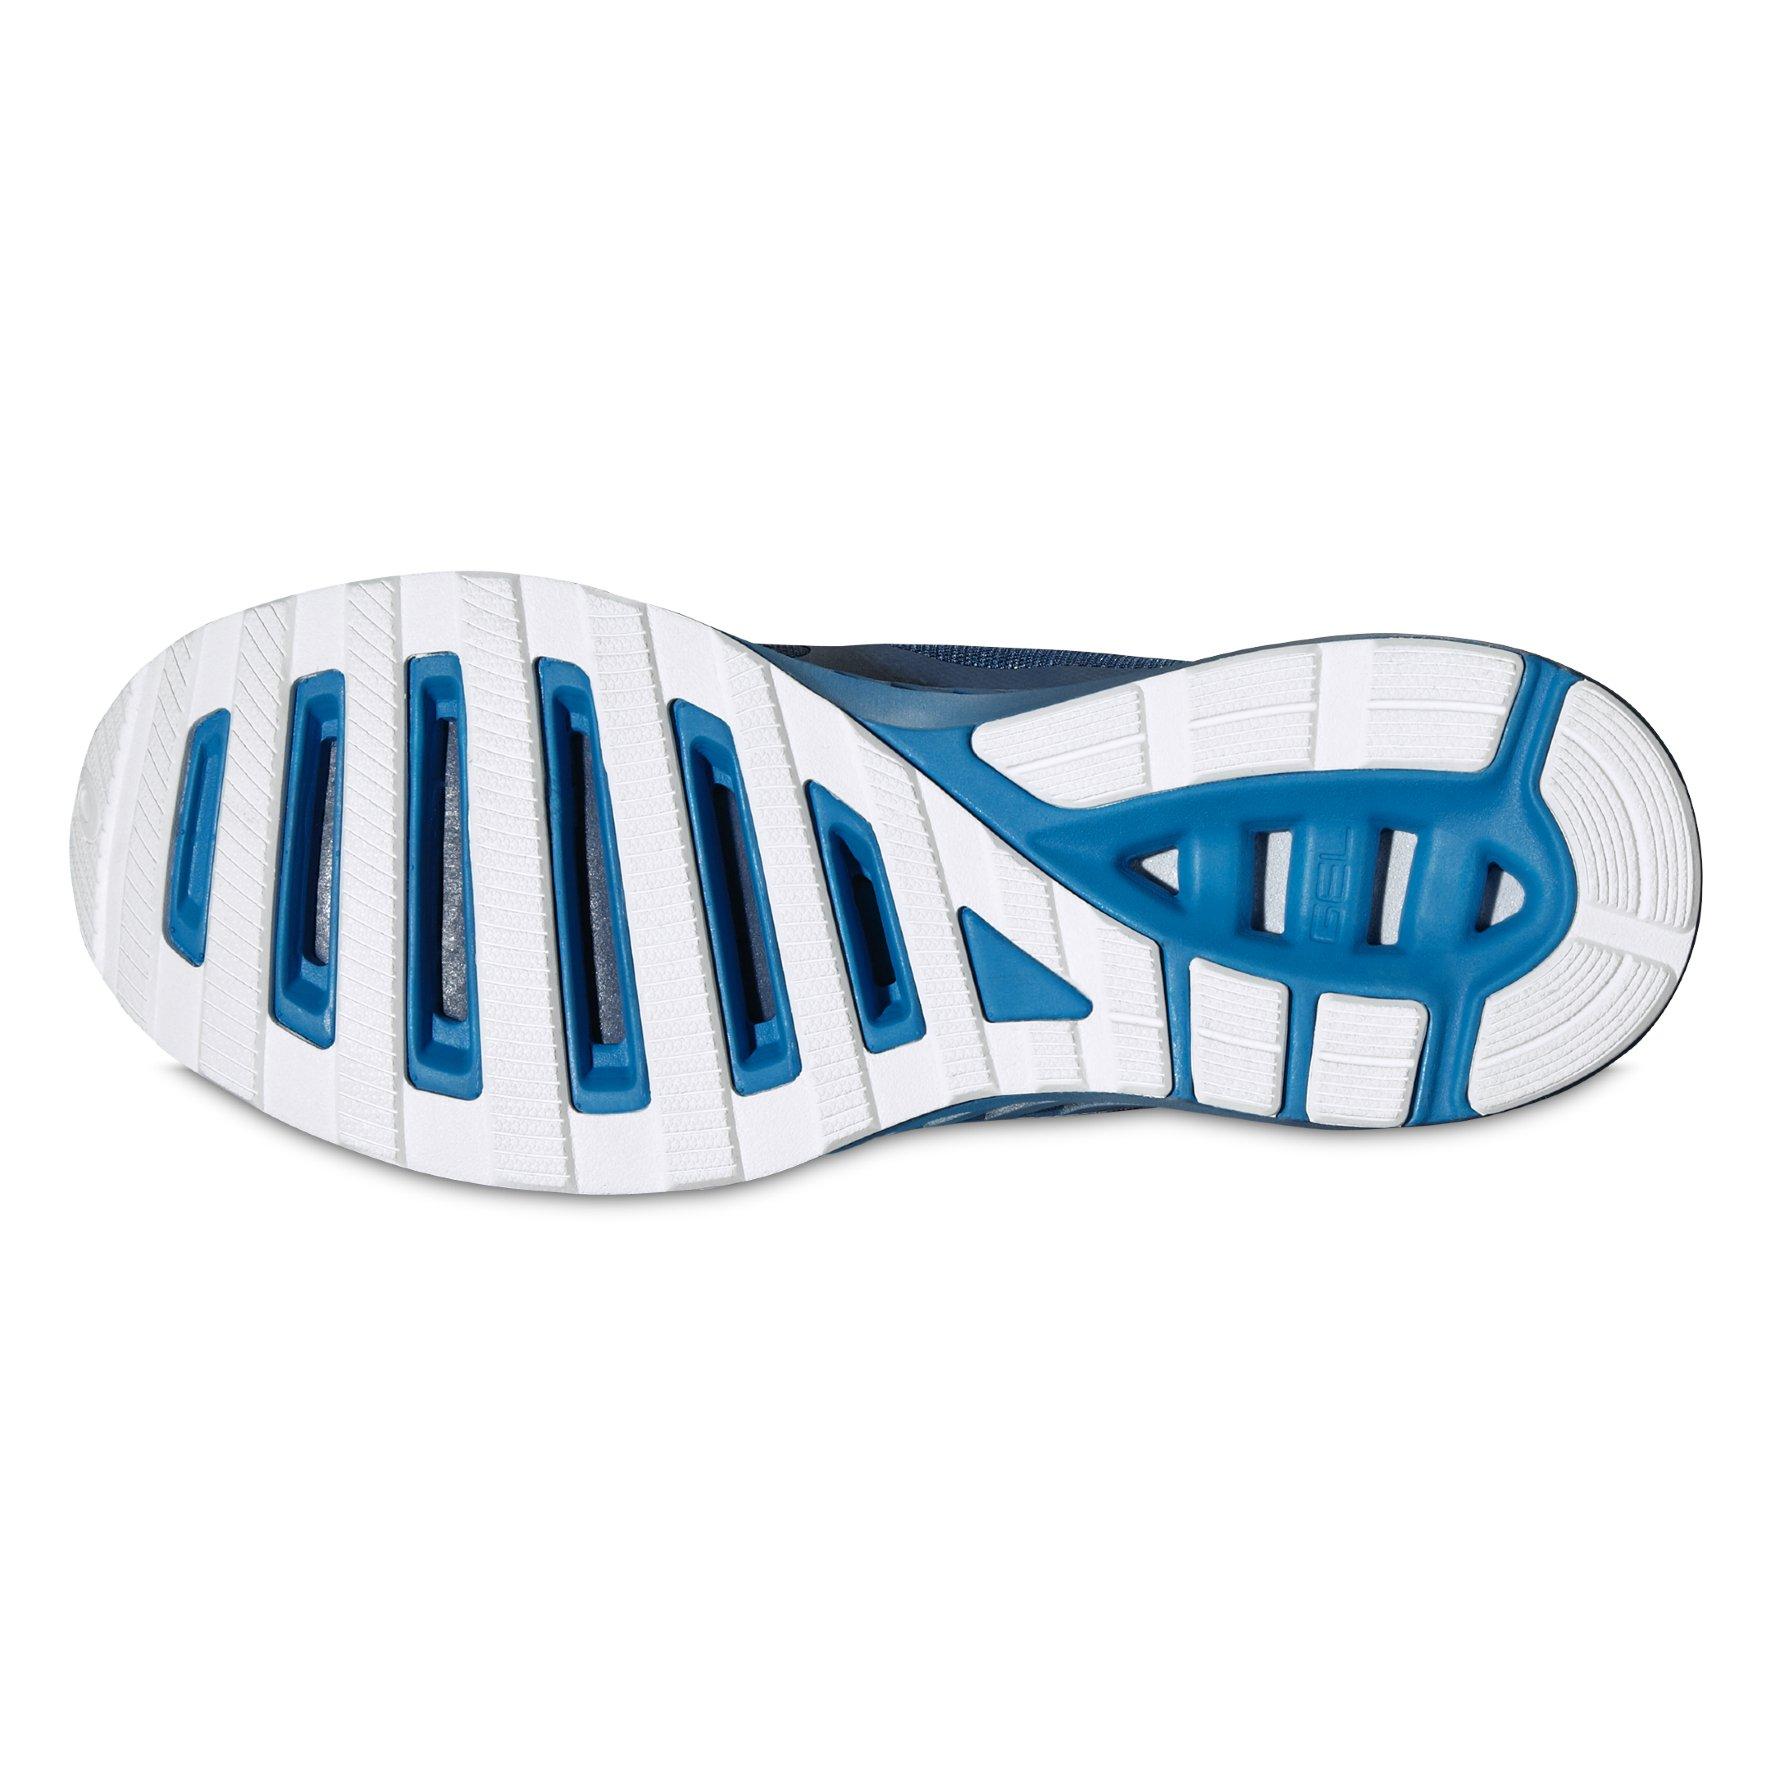 Купить кроссовки Asics Fuze X Lyte   Интернет-магазин Лаборатория бега 4db0a630321